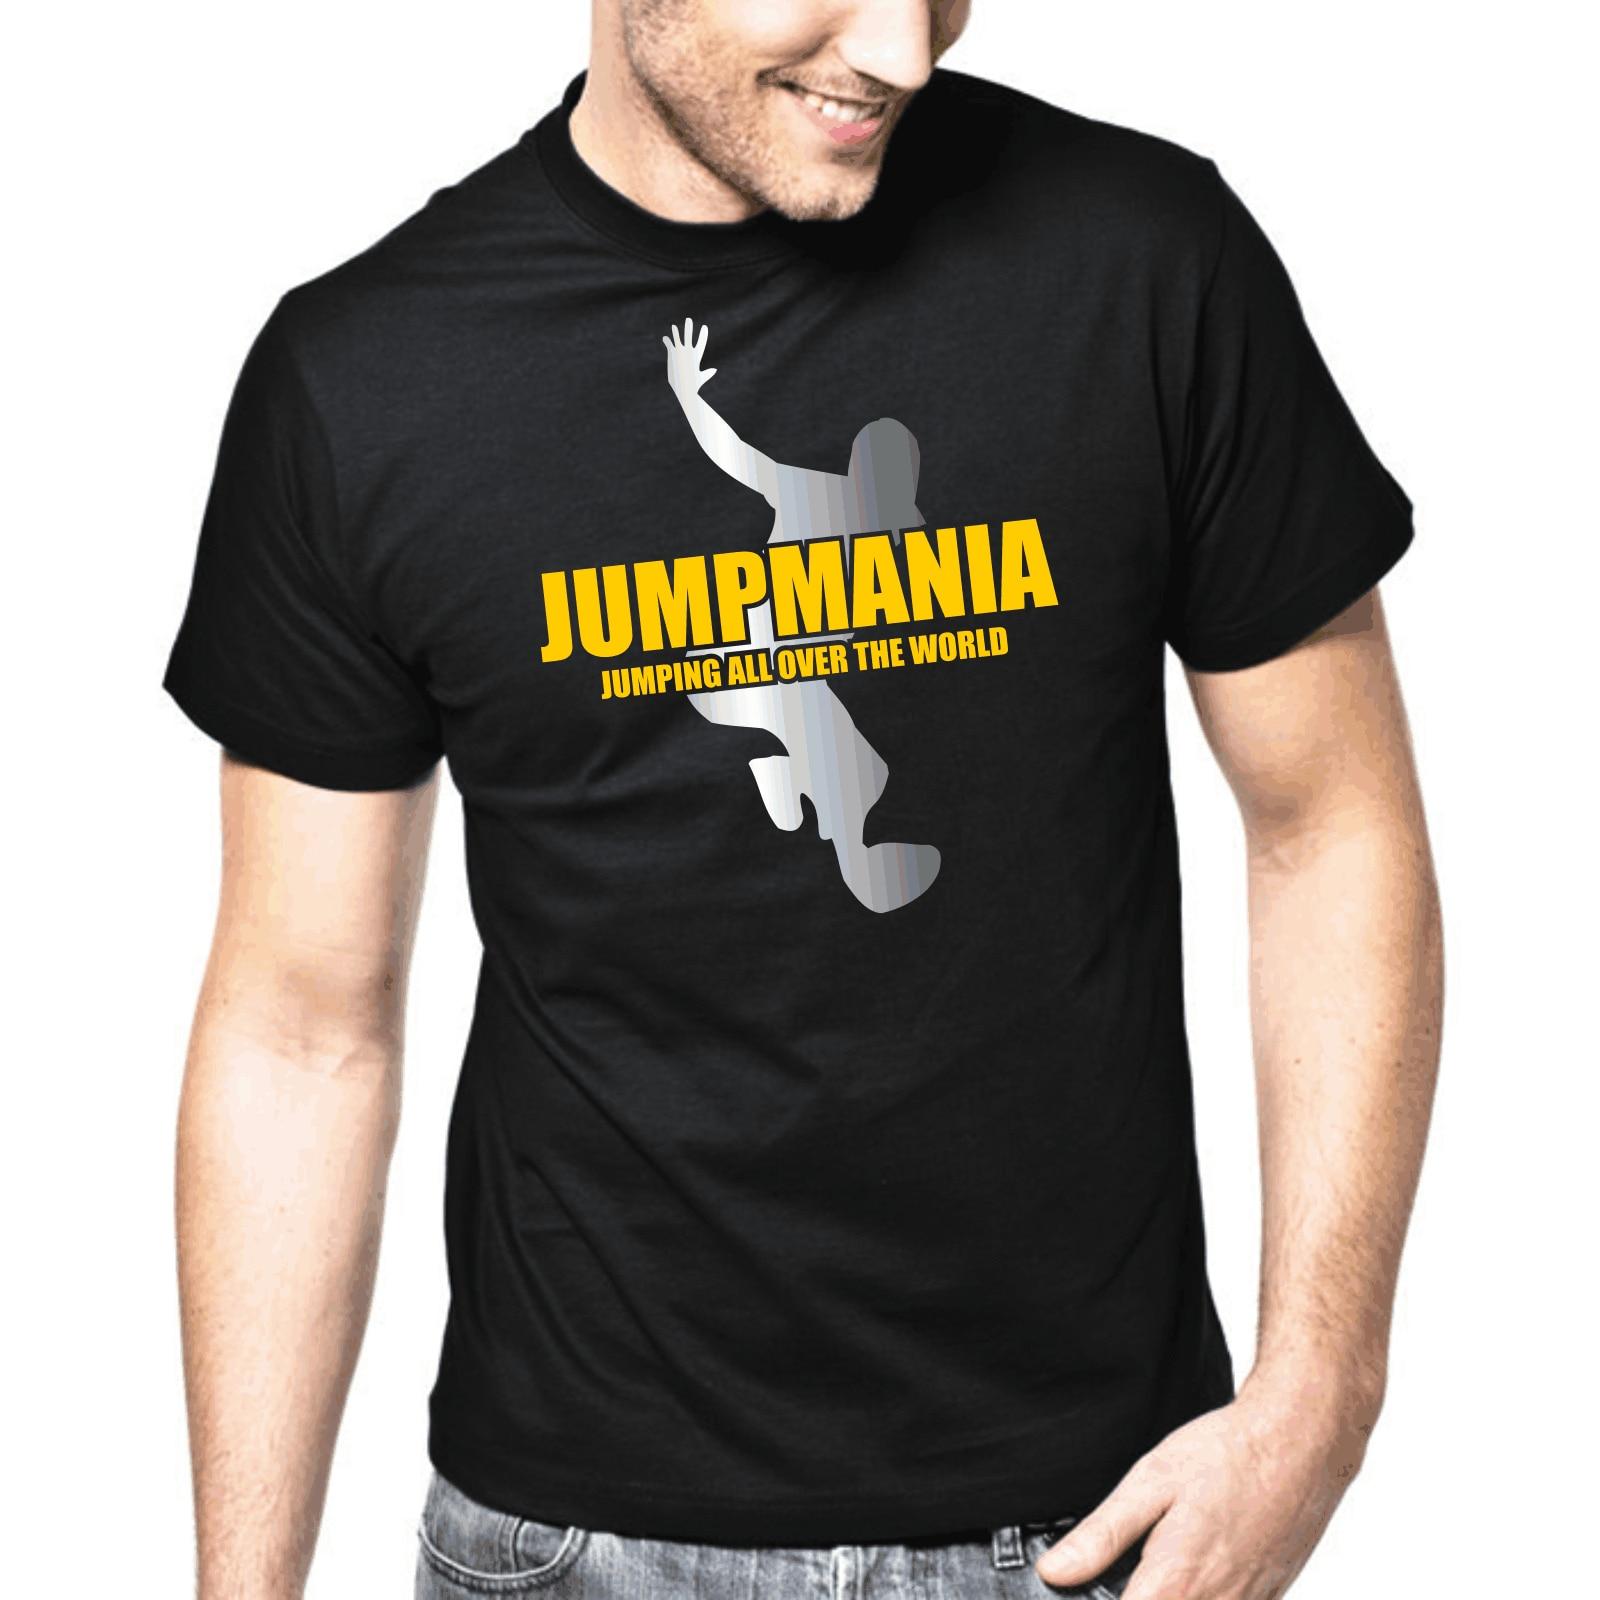 Jumpmania   Jumpstyle   Hardstyle   DJ   Jersey   Danza   Música   S-3XL Camiseta Hombre impresión T camisa Hipster Camiseta Tee superior tendencia